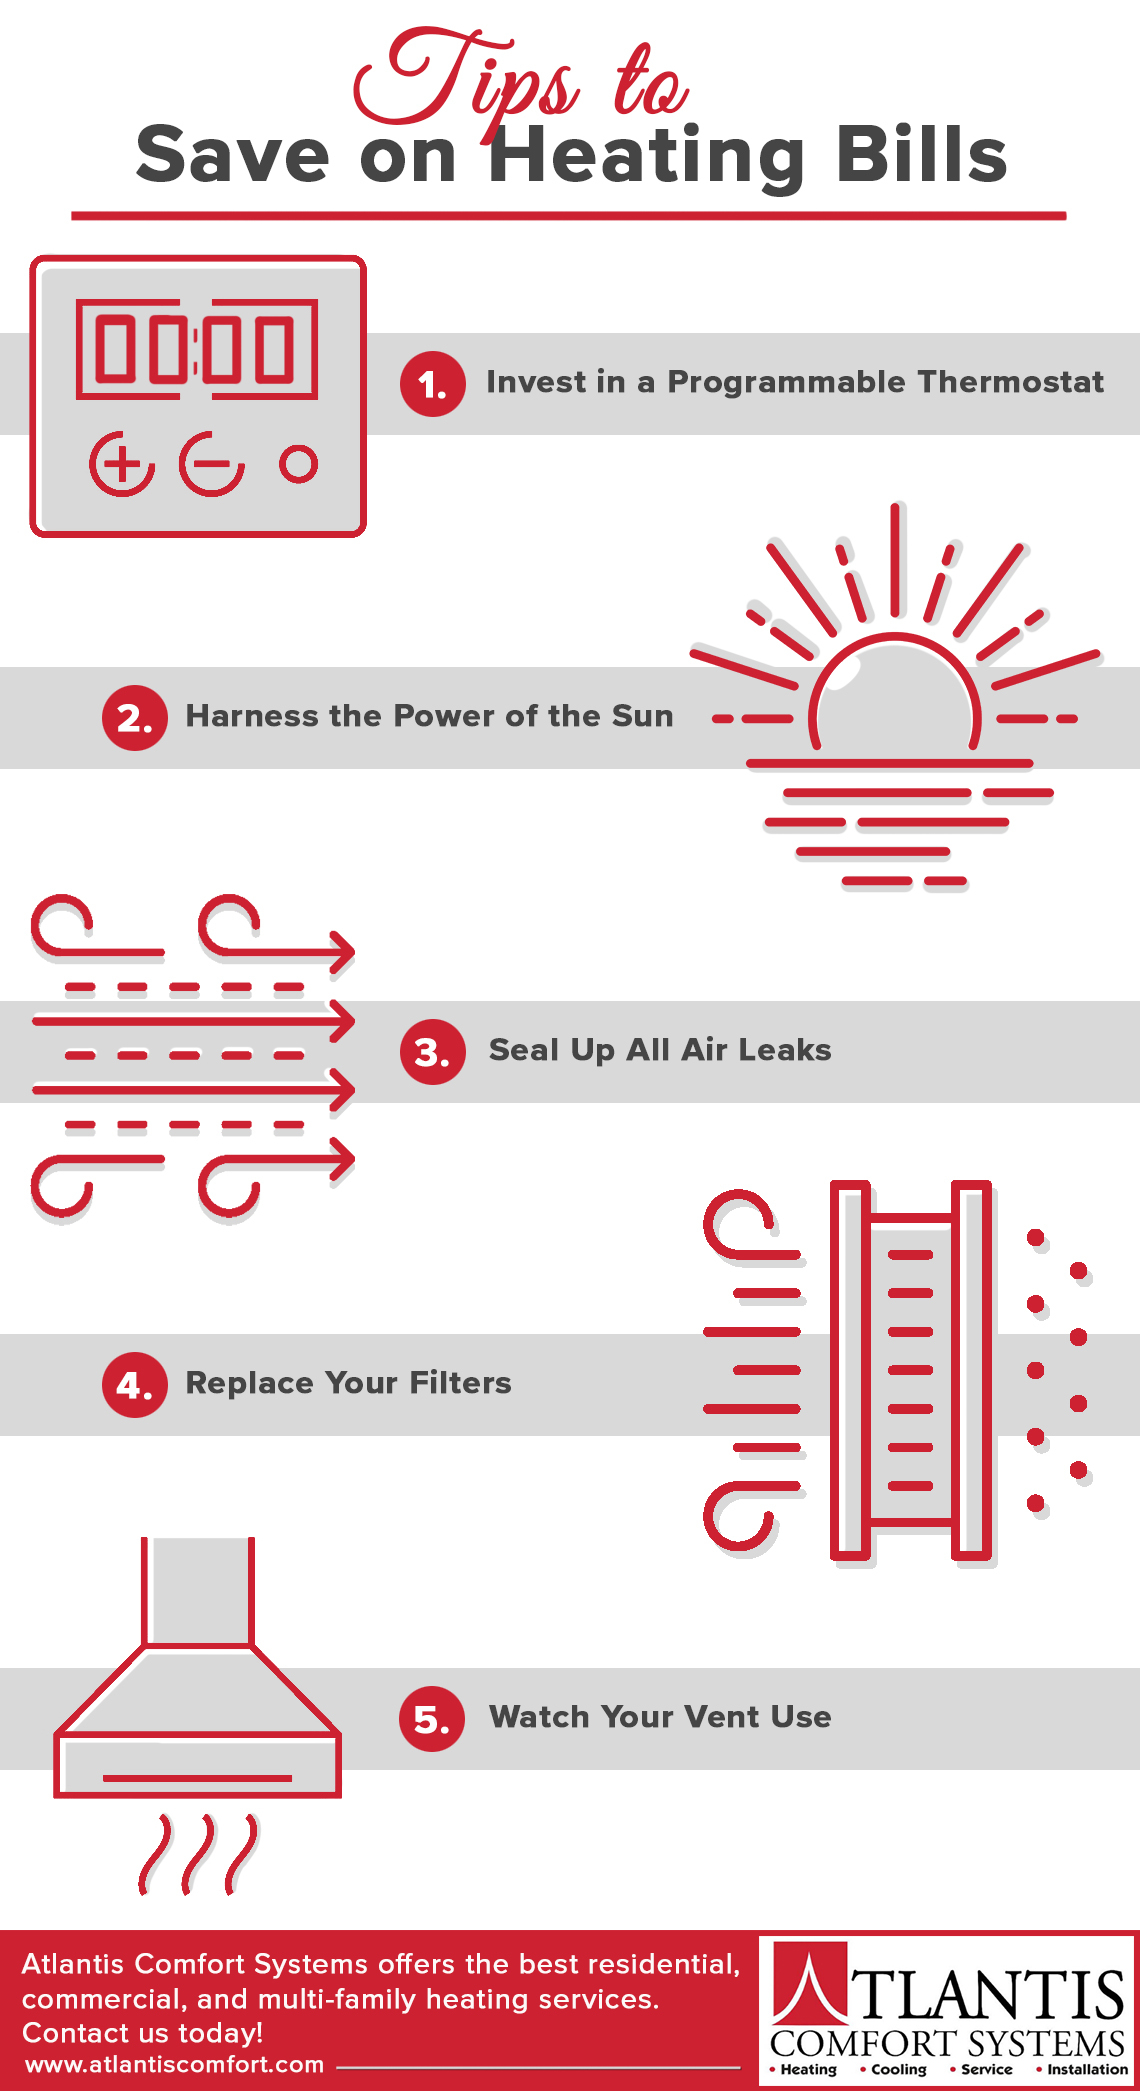 Tips to Save on Heating Bills.jpg